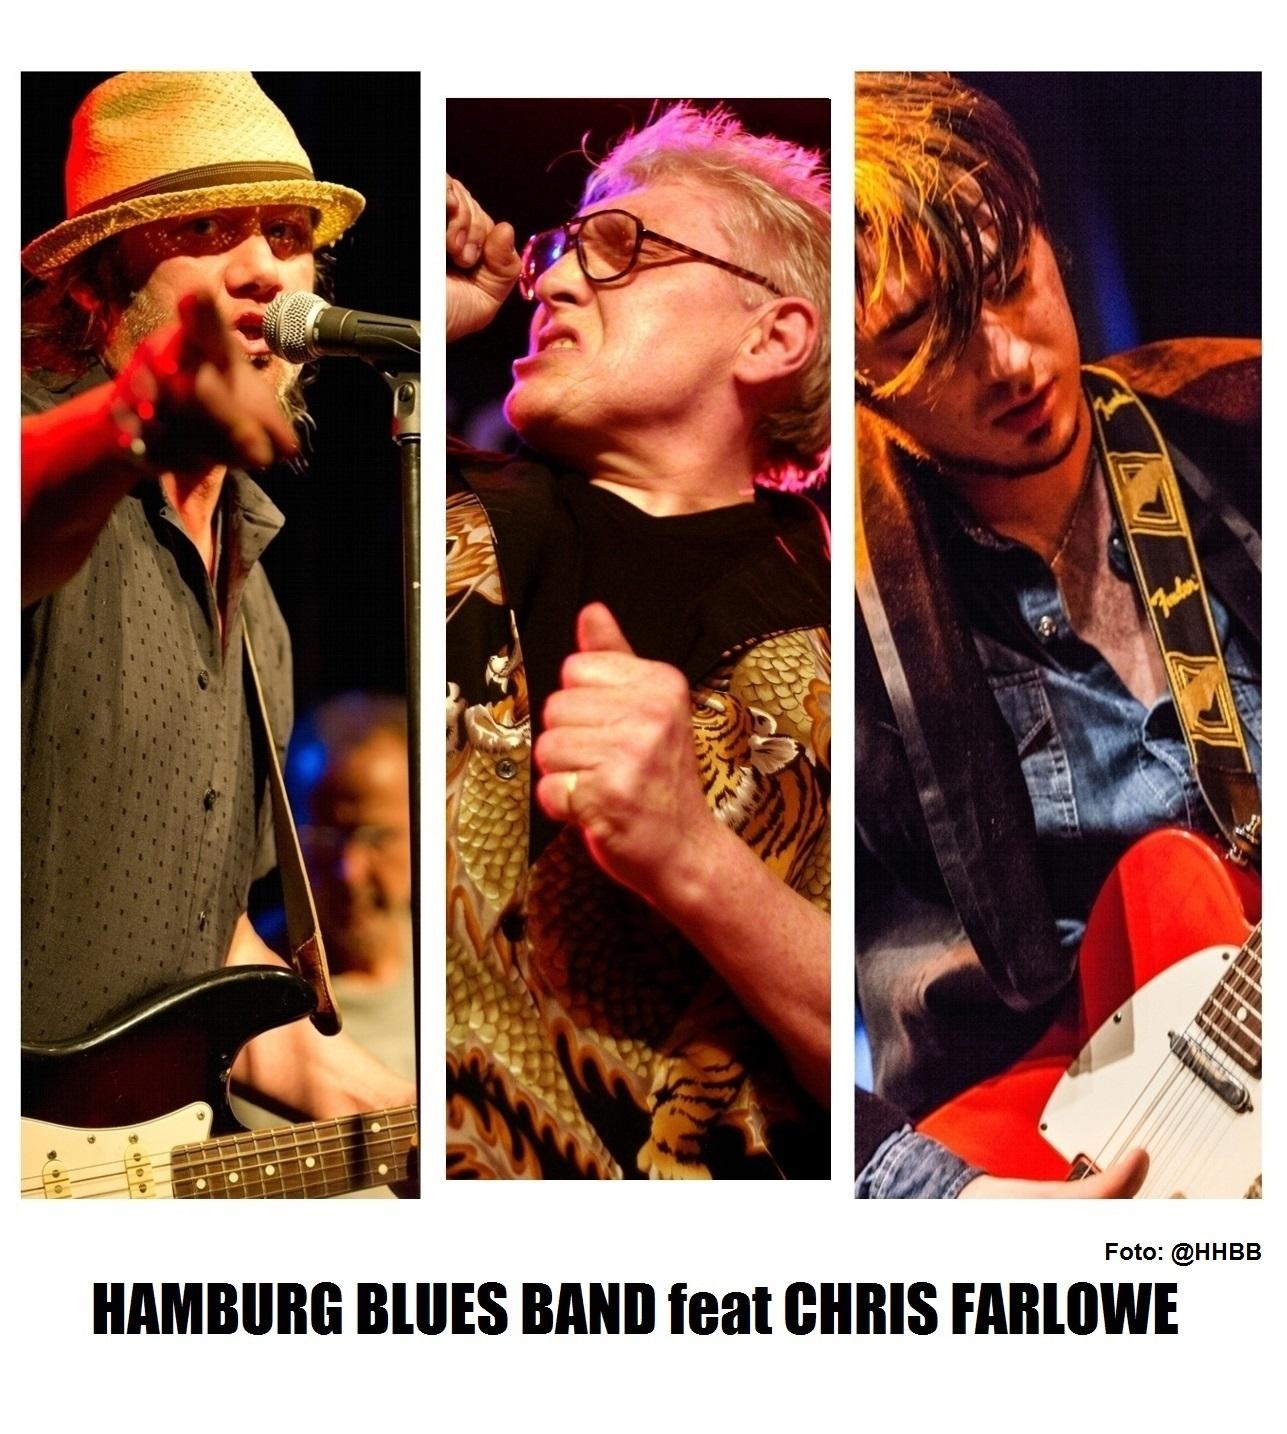 The HAMBURG BLUES BAND feat. Chris Farlowe & Krissy Matthews am 7. November 2021 @ Reigen.